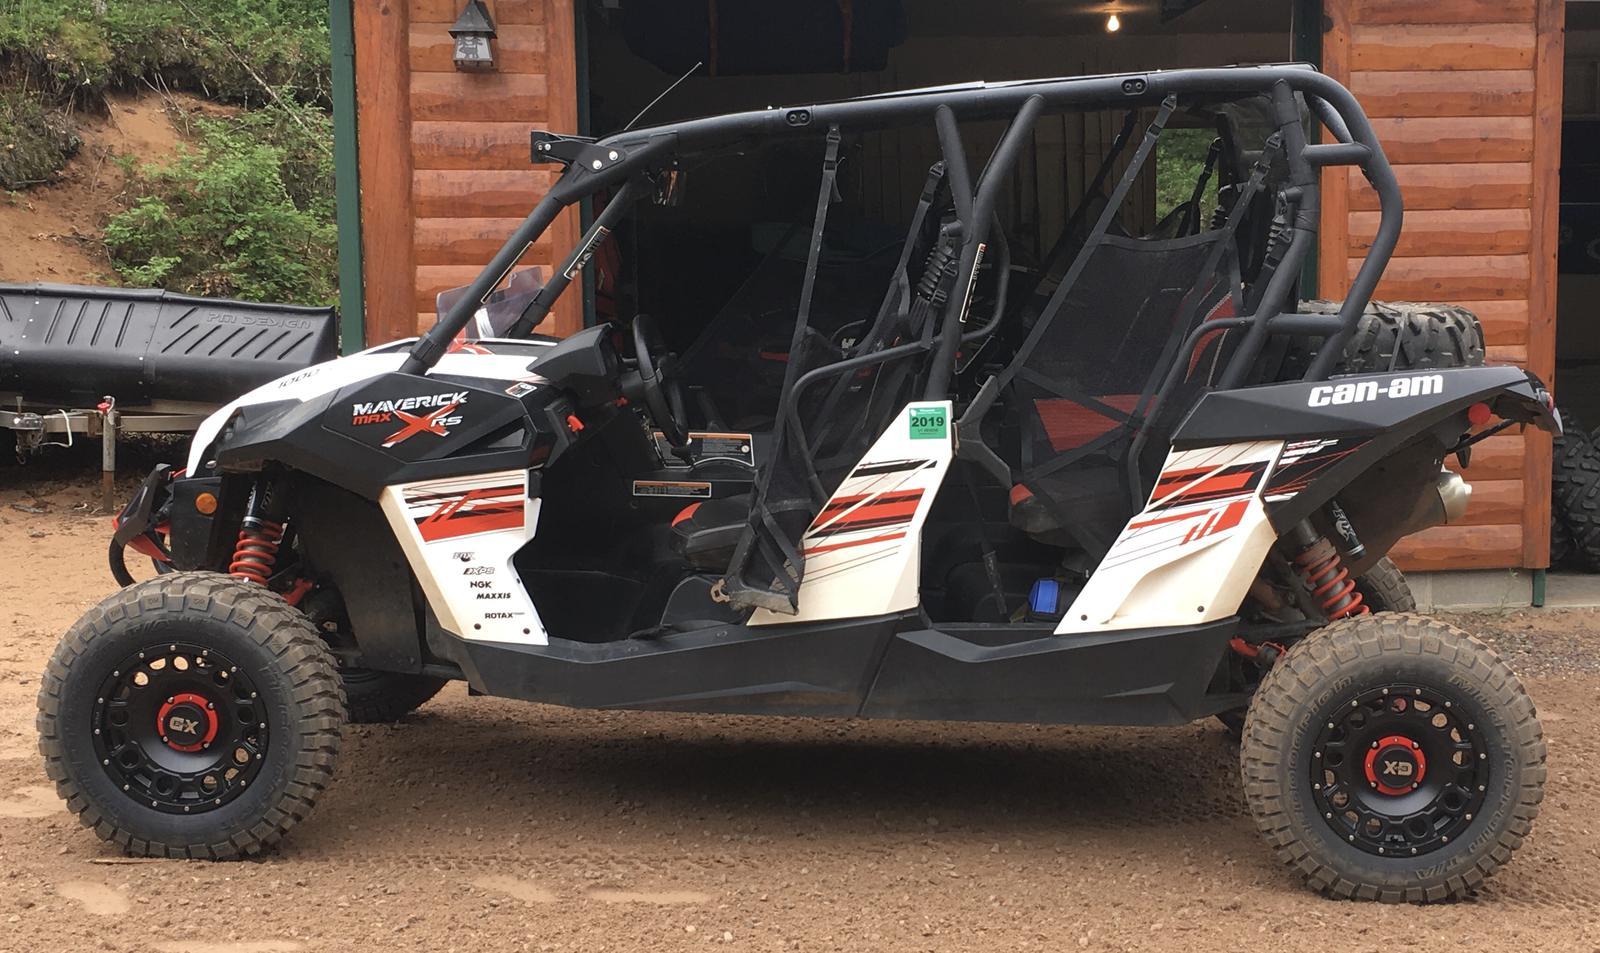 ATV & Side x Sides TIRES PLUS Willmar MN 320 222 8473